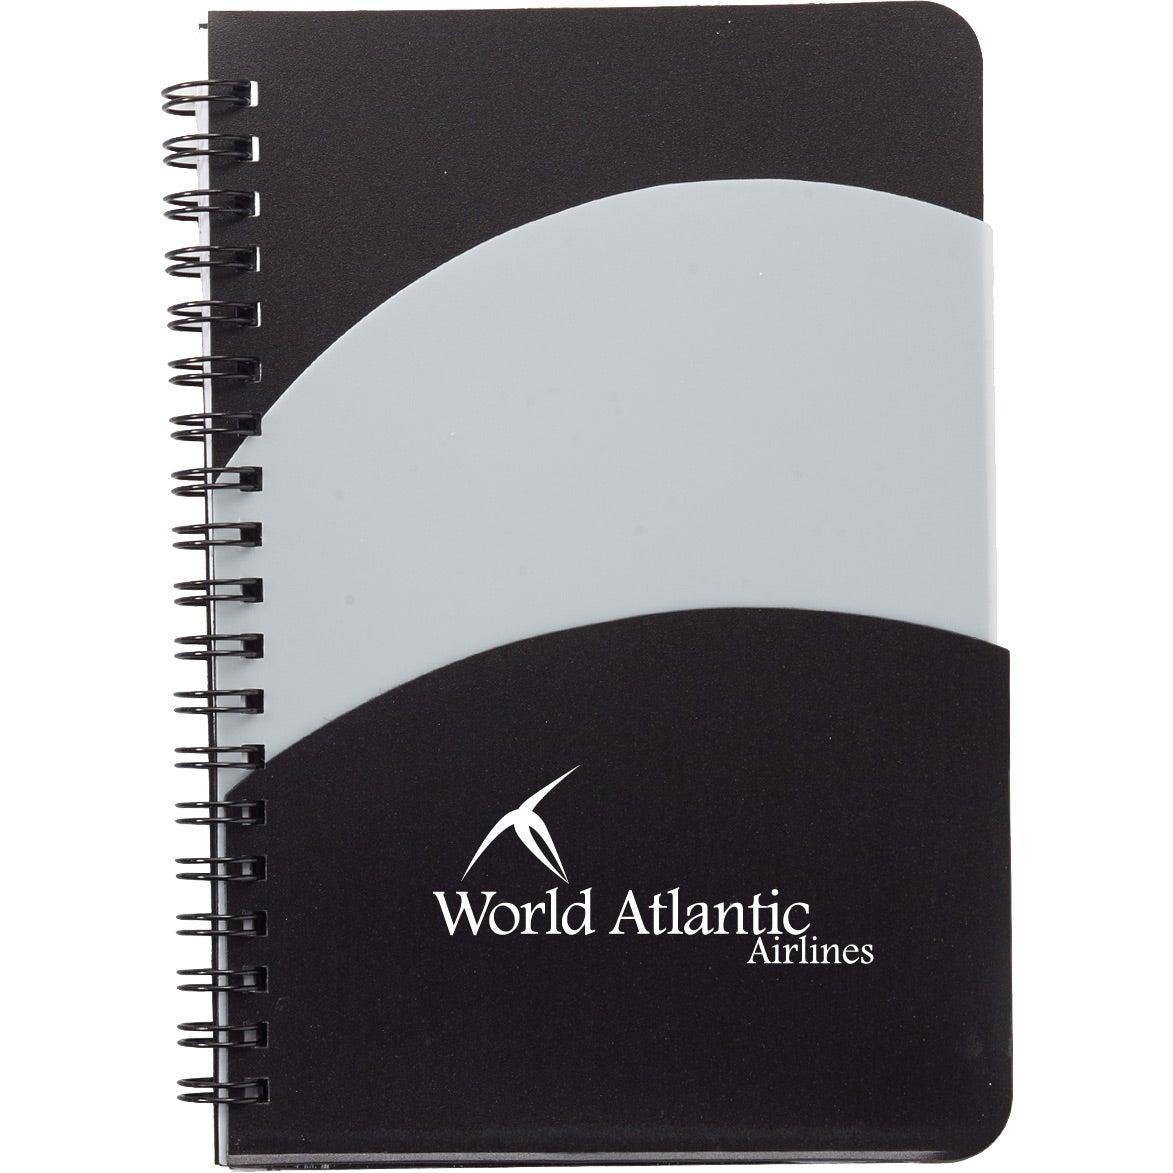 "Santiago Notebook (5"" x 7"")"